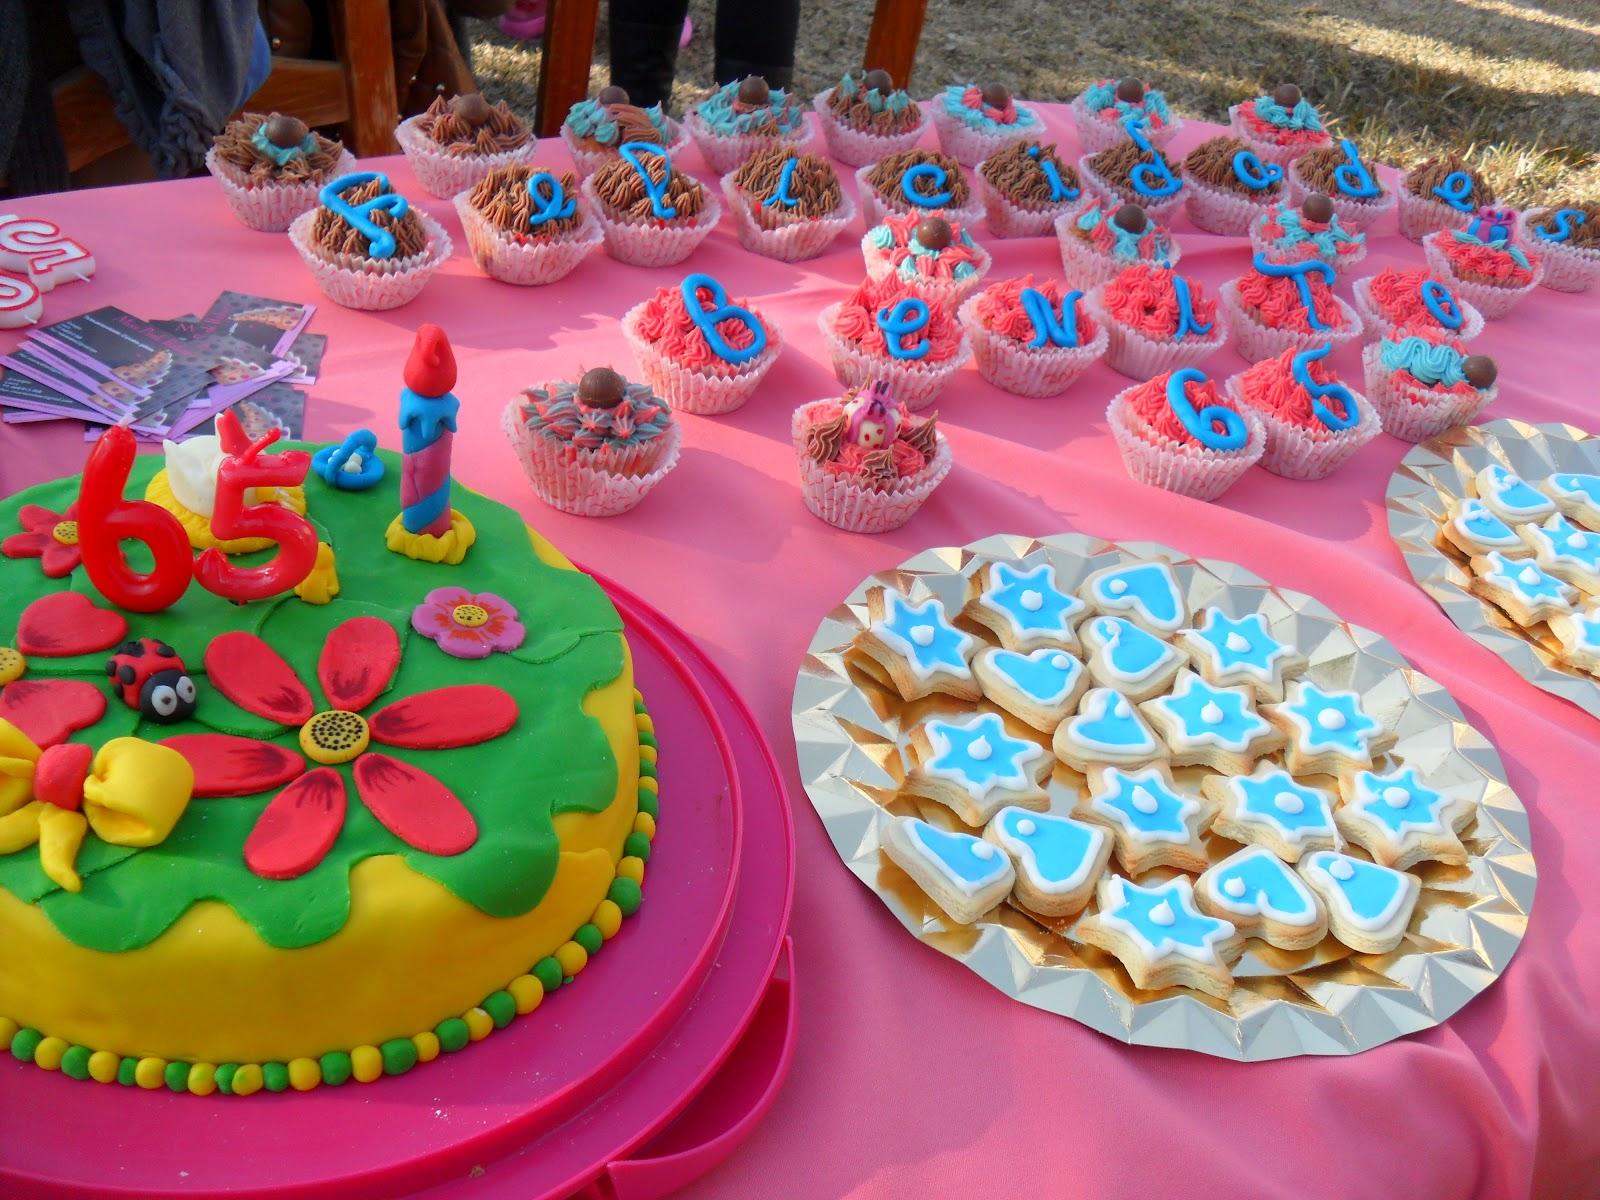 Mesas dulces para cumplea os imagui for Mesas dulces cumpleanos